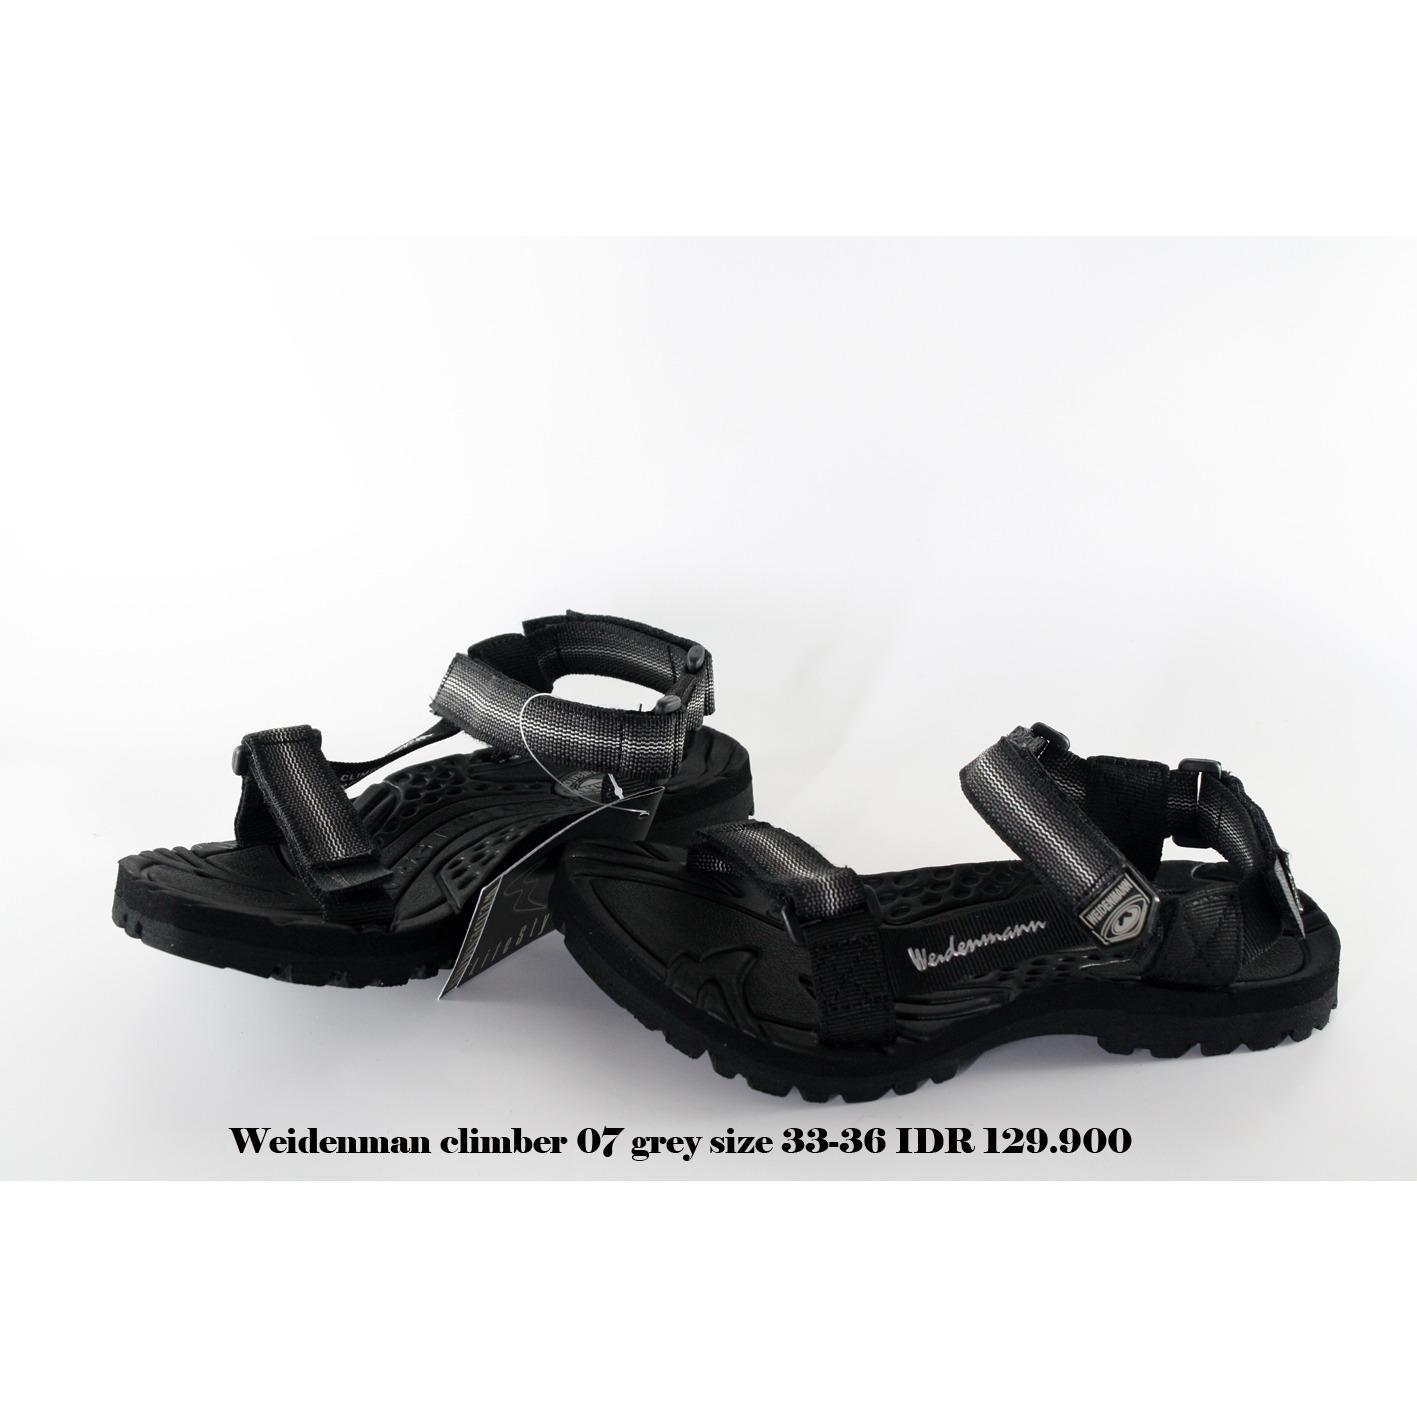 Daftar Harga Garucci Formal Shoes Pria Black Gh 0383 Termurah 2018 Valentino Rudy Vr112 2337s Jam Tangan Wanita Silver Fashion Weidenmann Desember